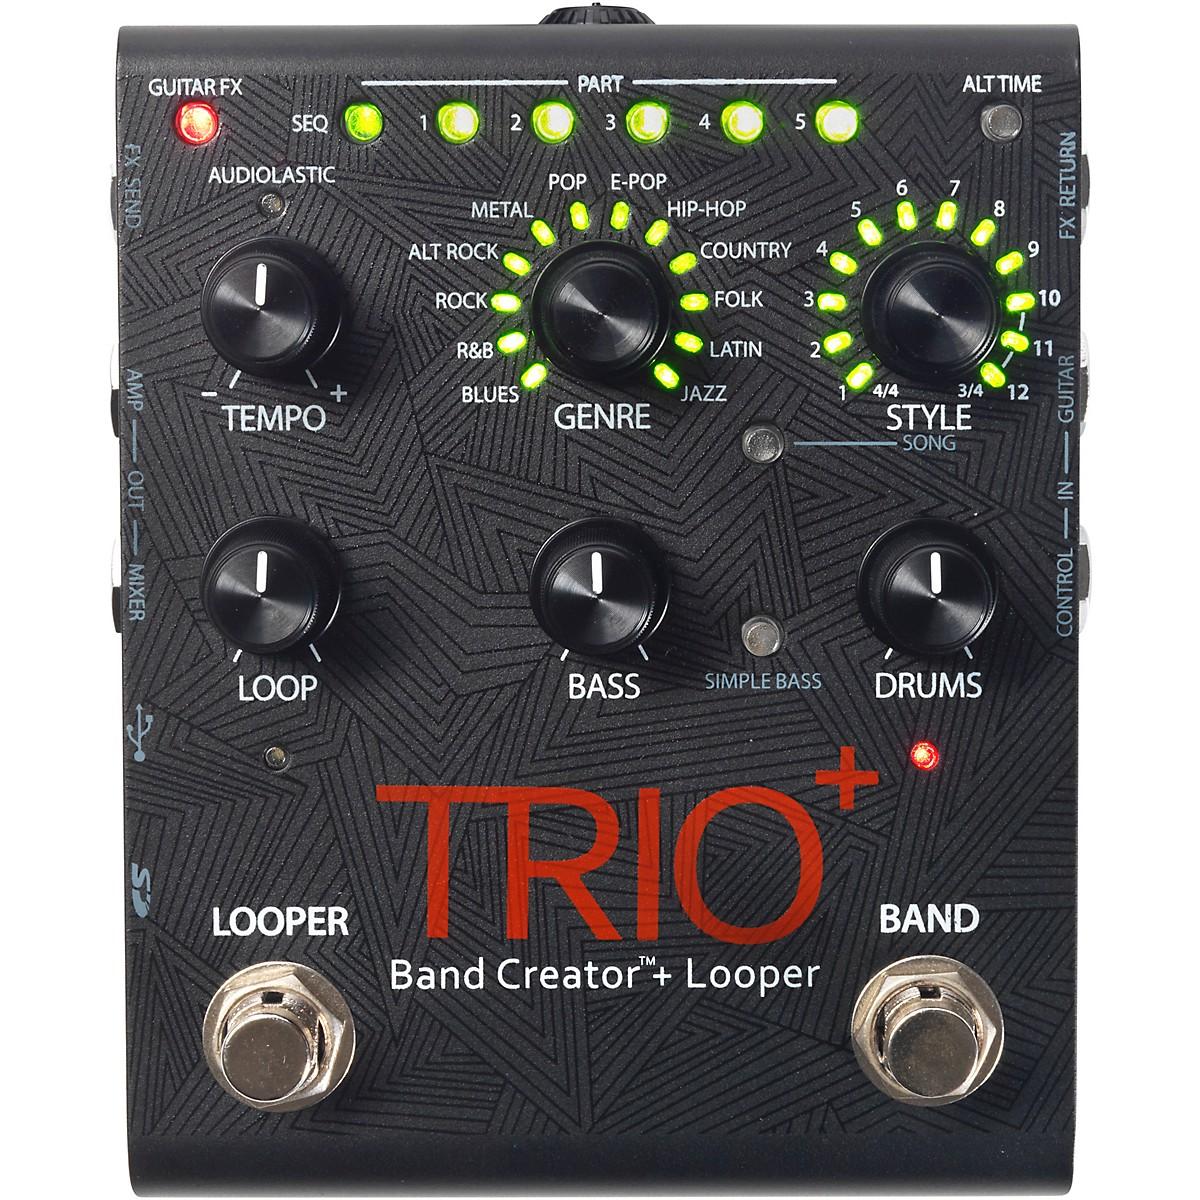 DigiTech Trio+ Band Creator Plus Looper Guitar Effects Pedal